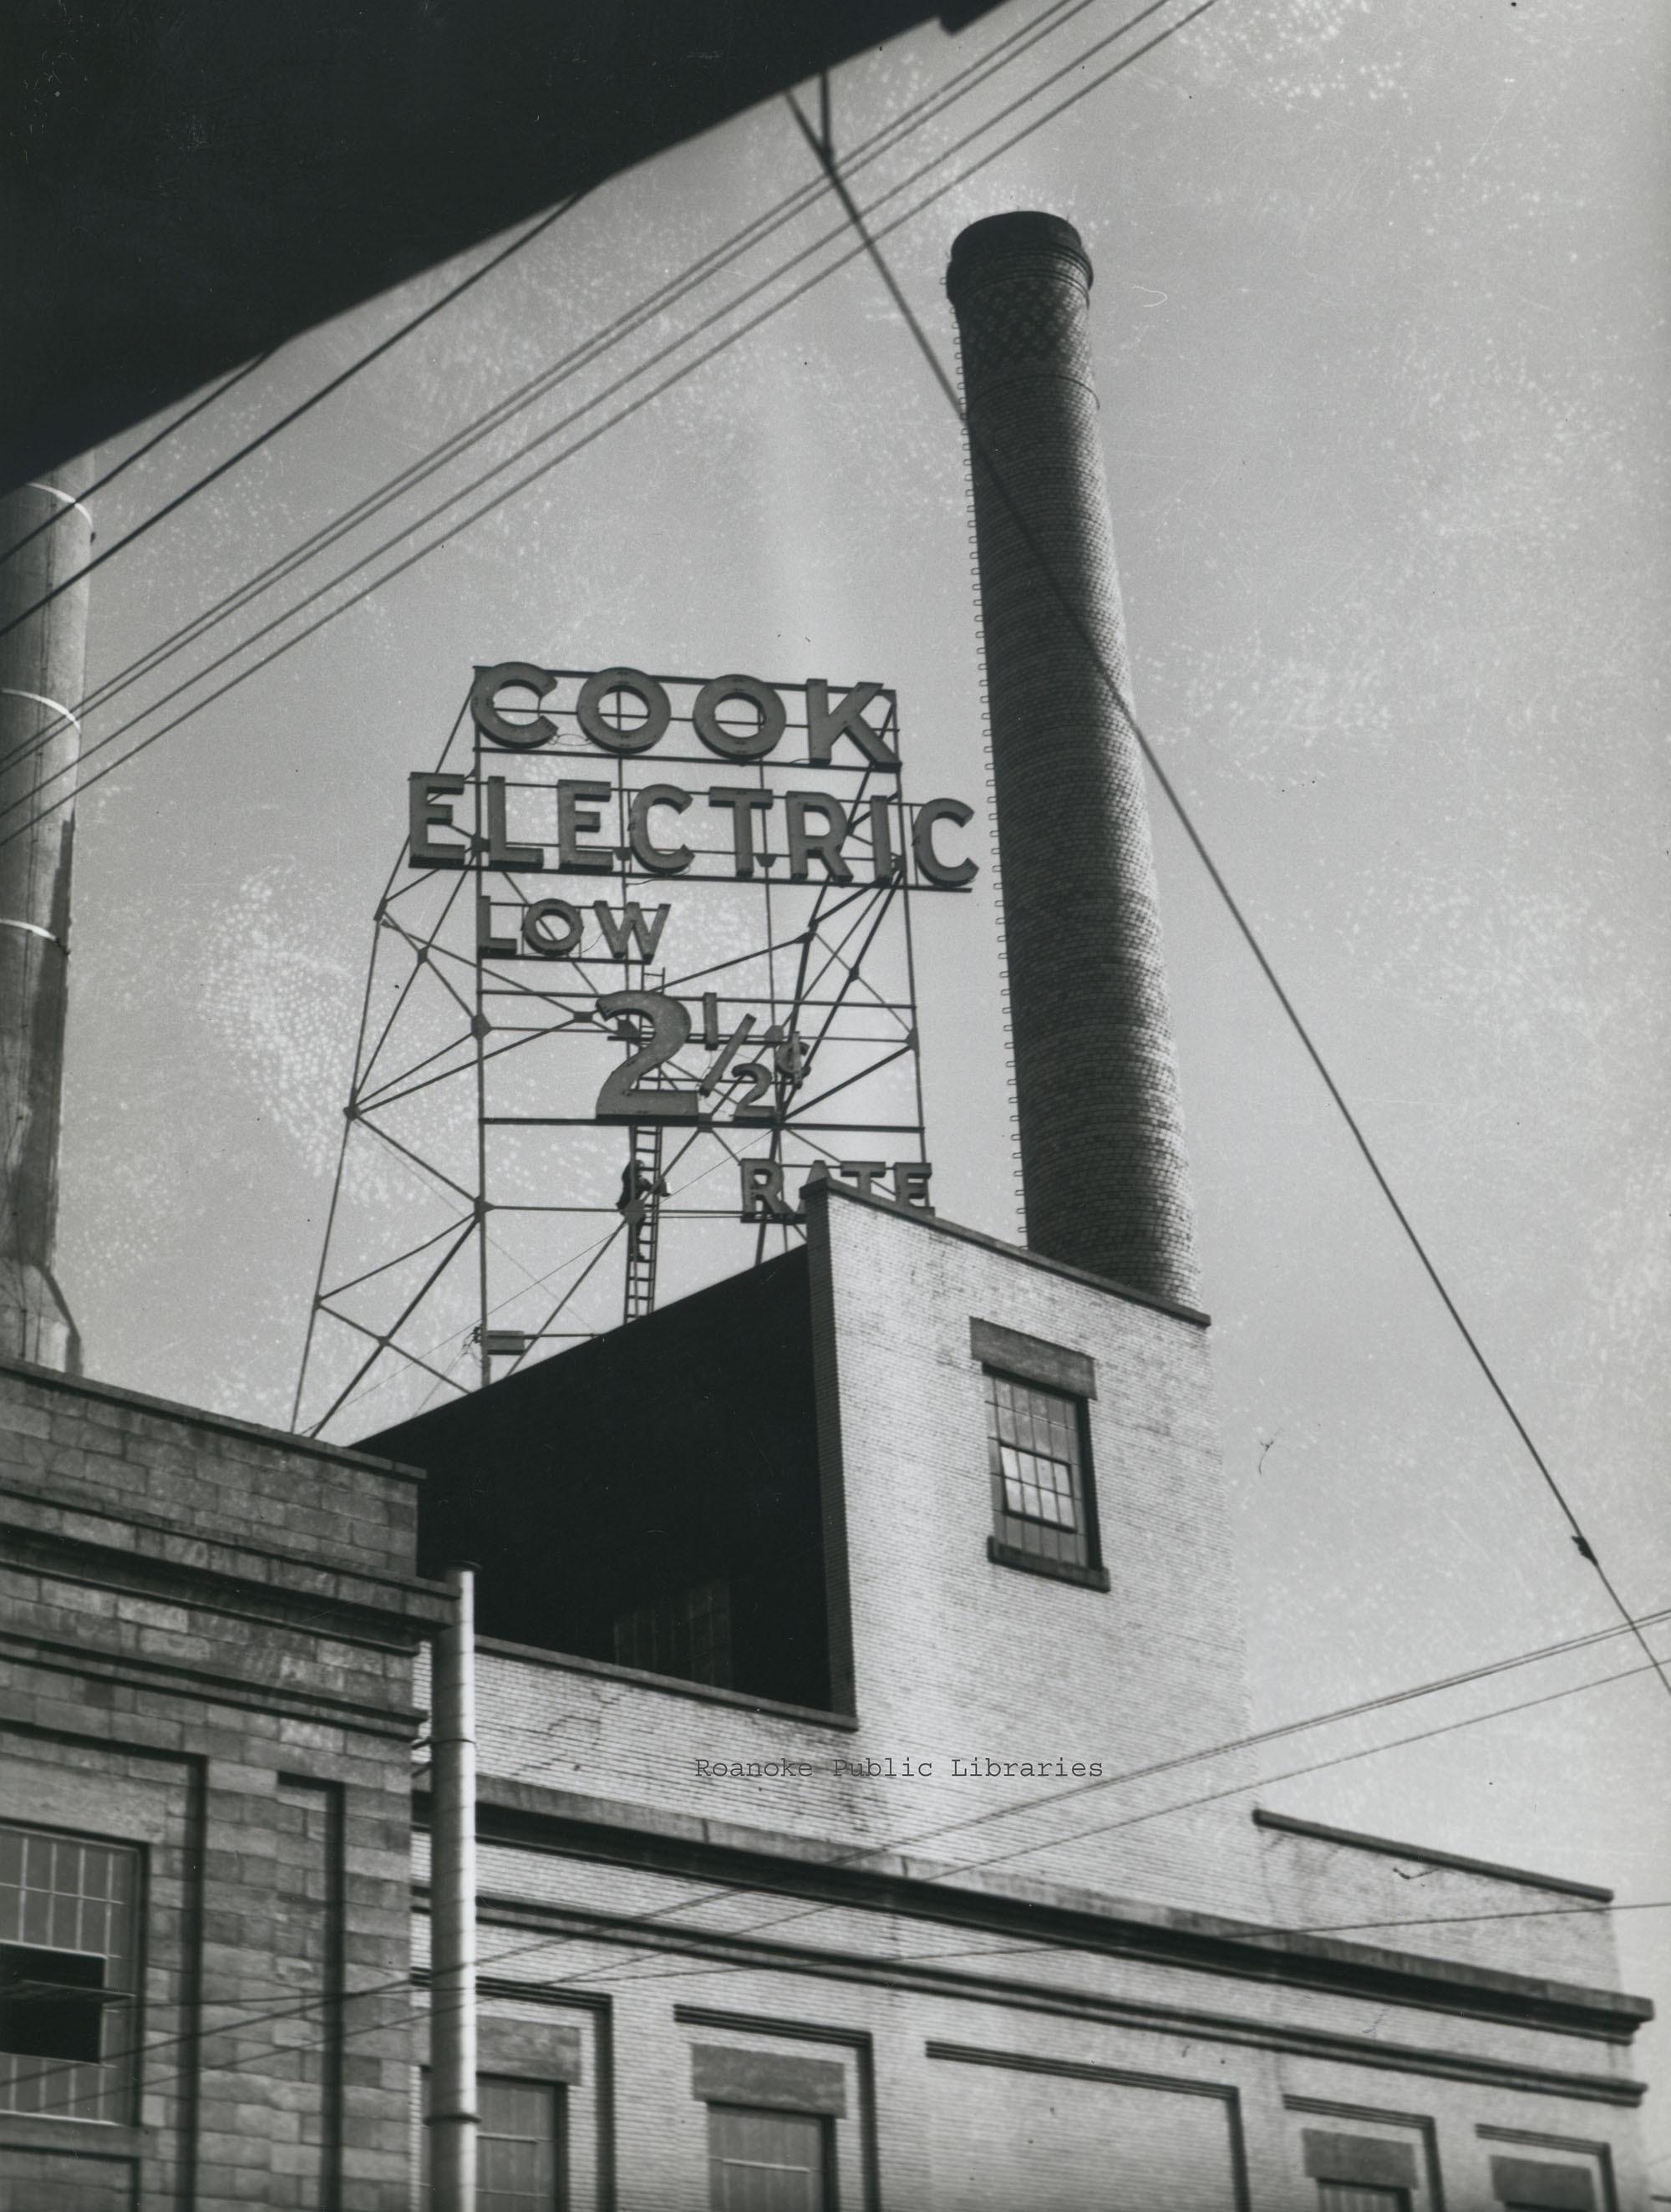 Davis 45.53 Cook Electric Sign.jpg